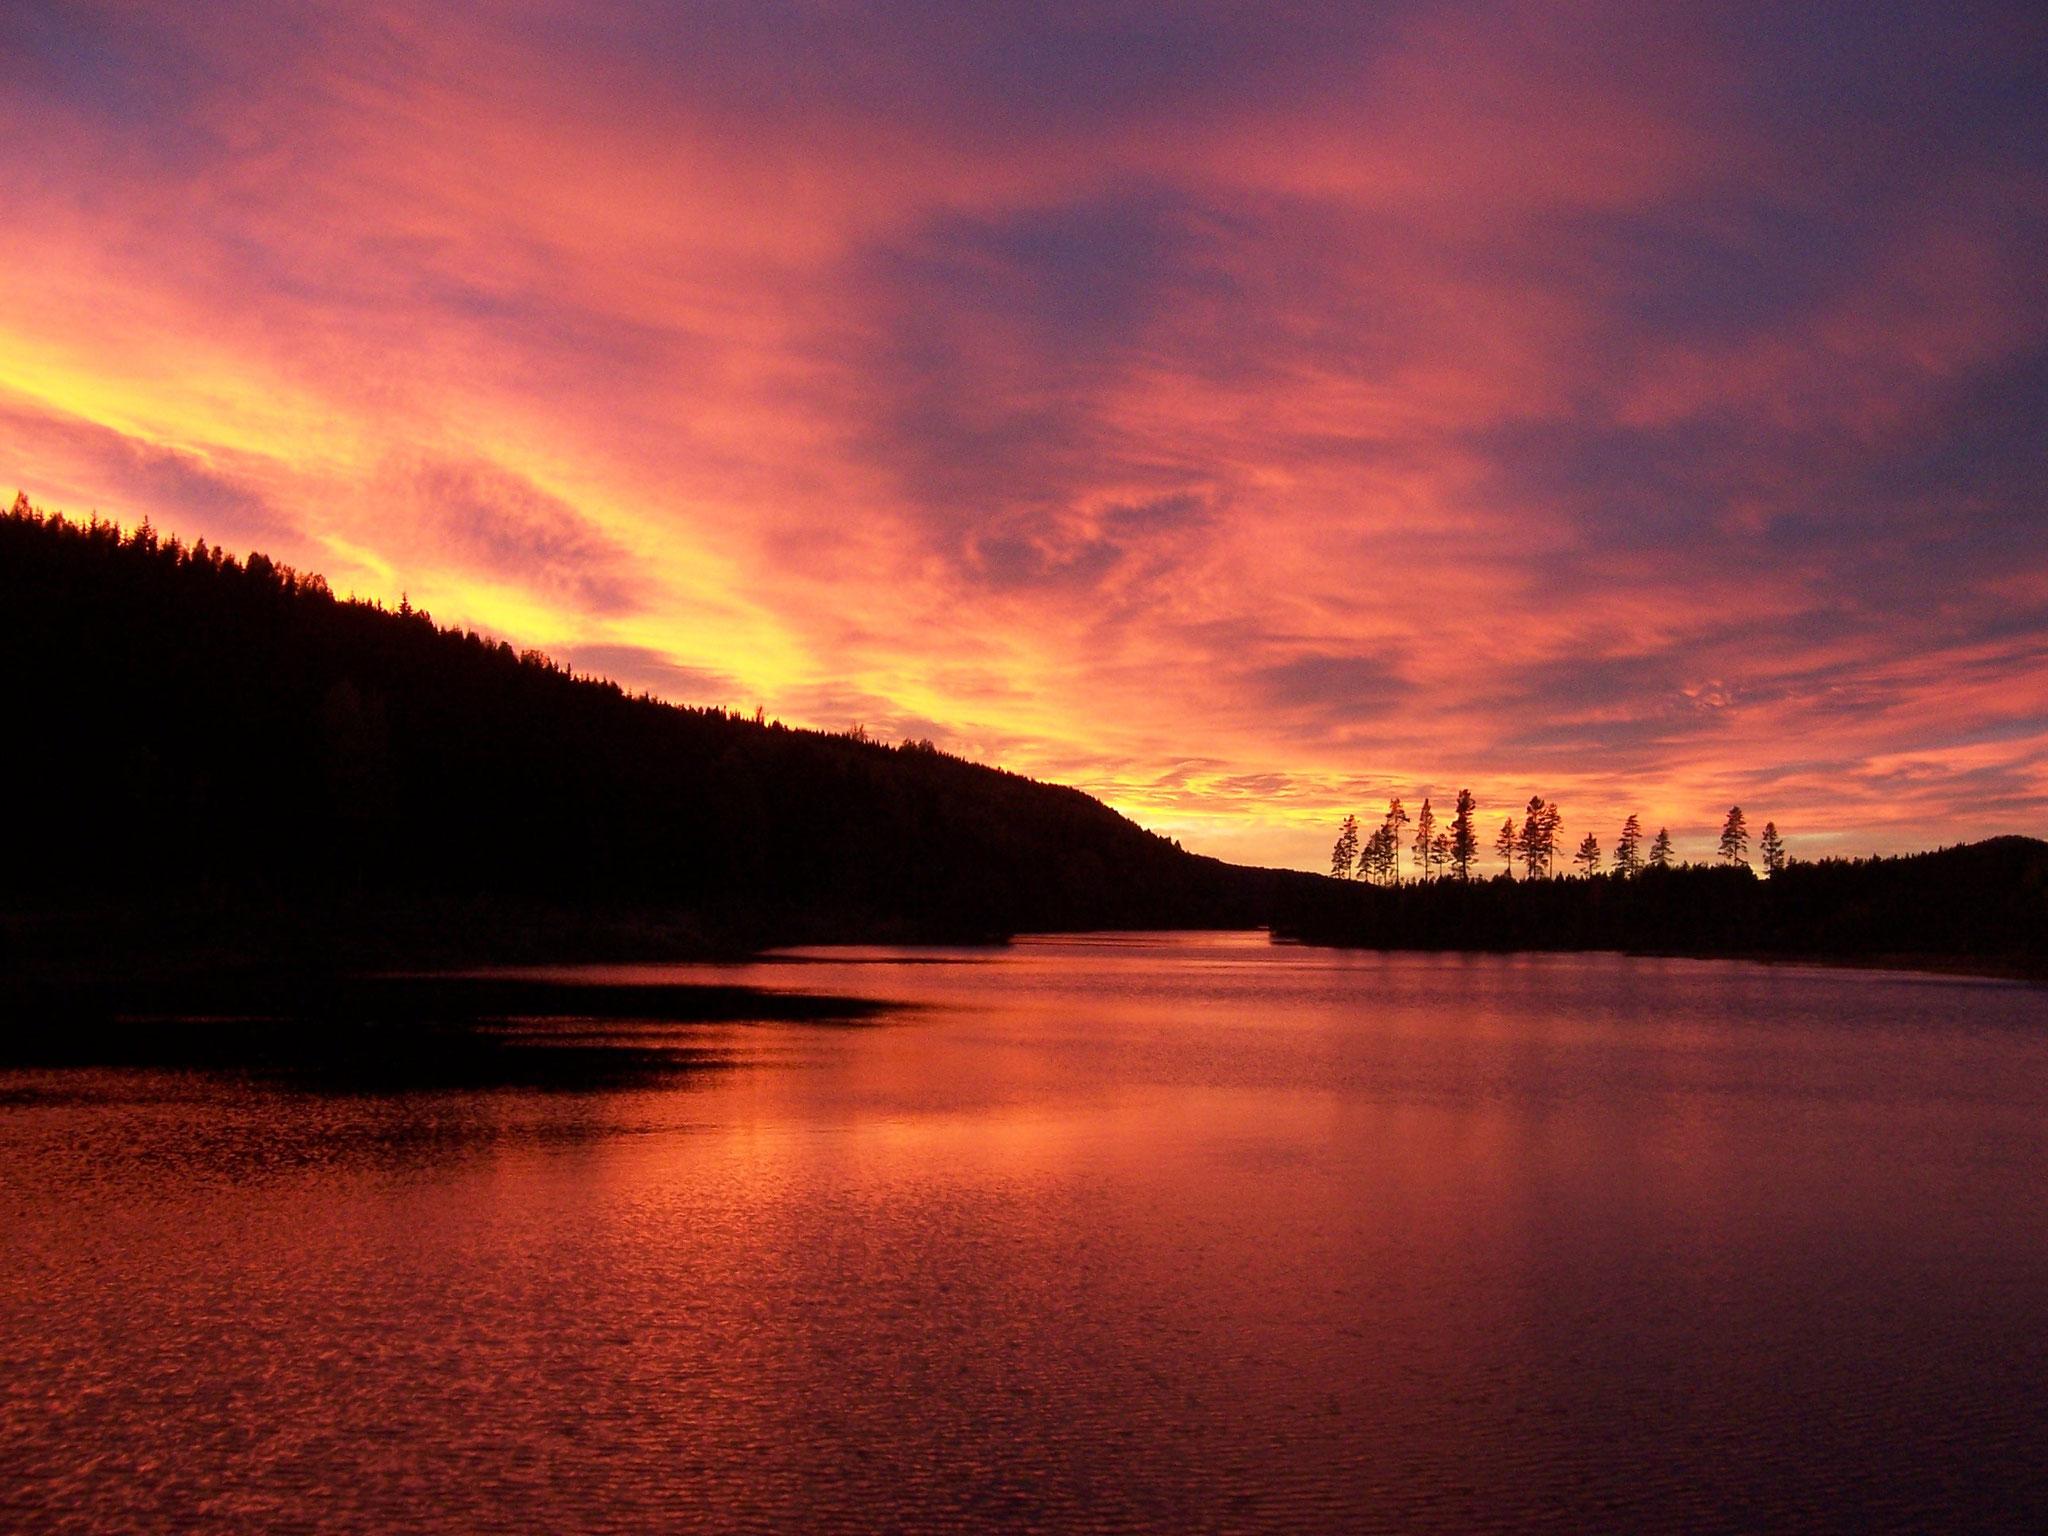 wunderbare Sonnenuntergänge